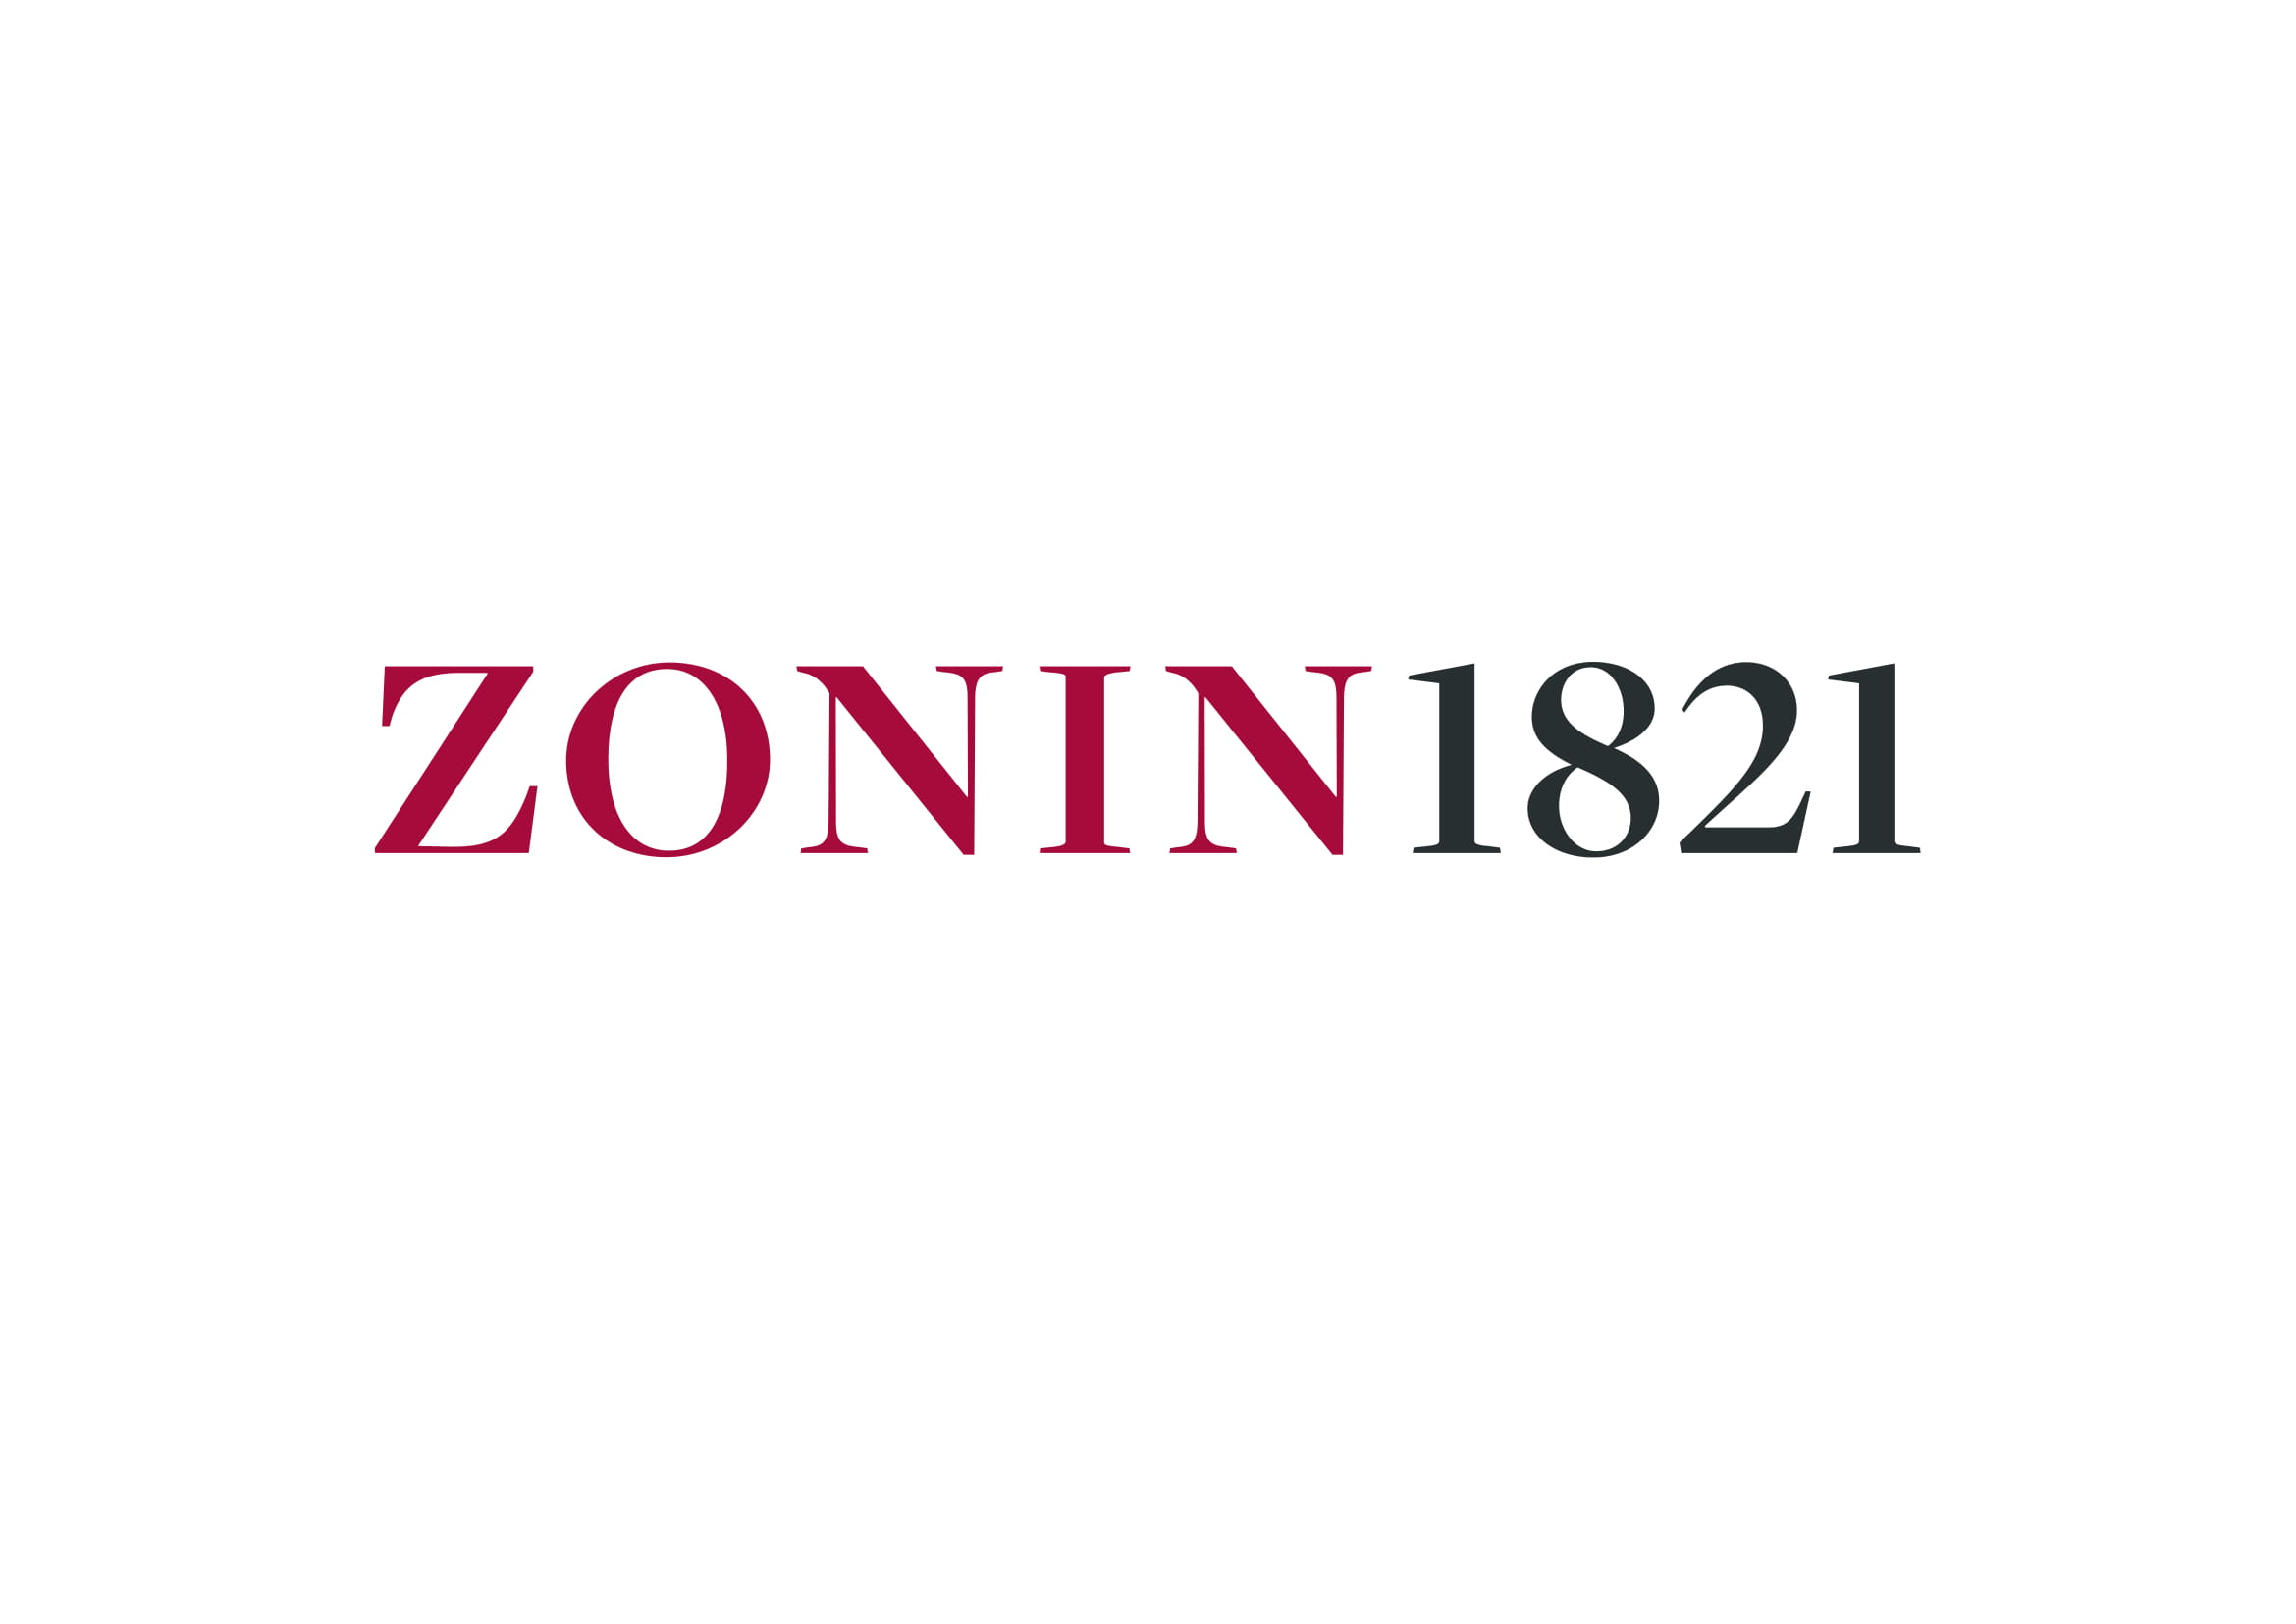 Logo Zonin1821-1